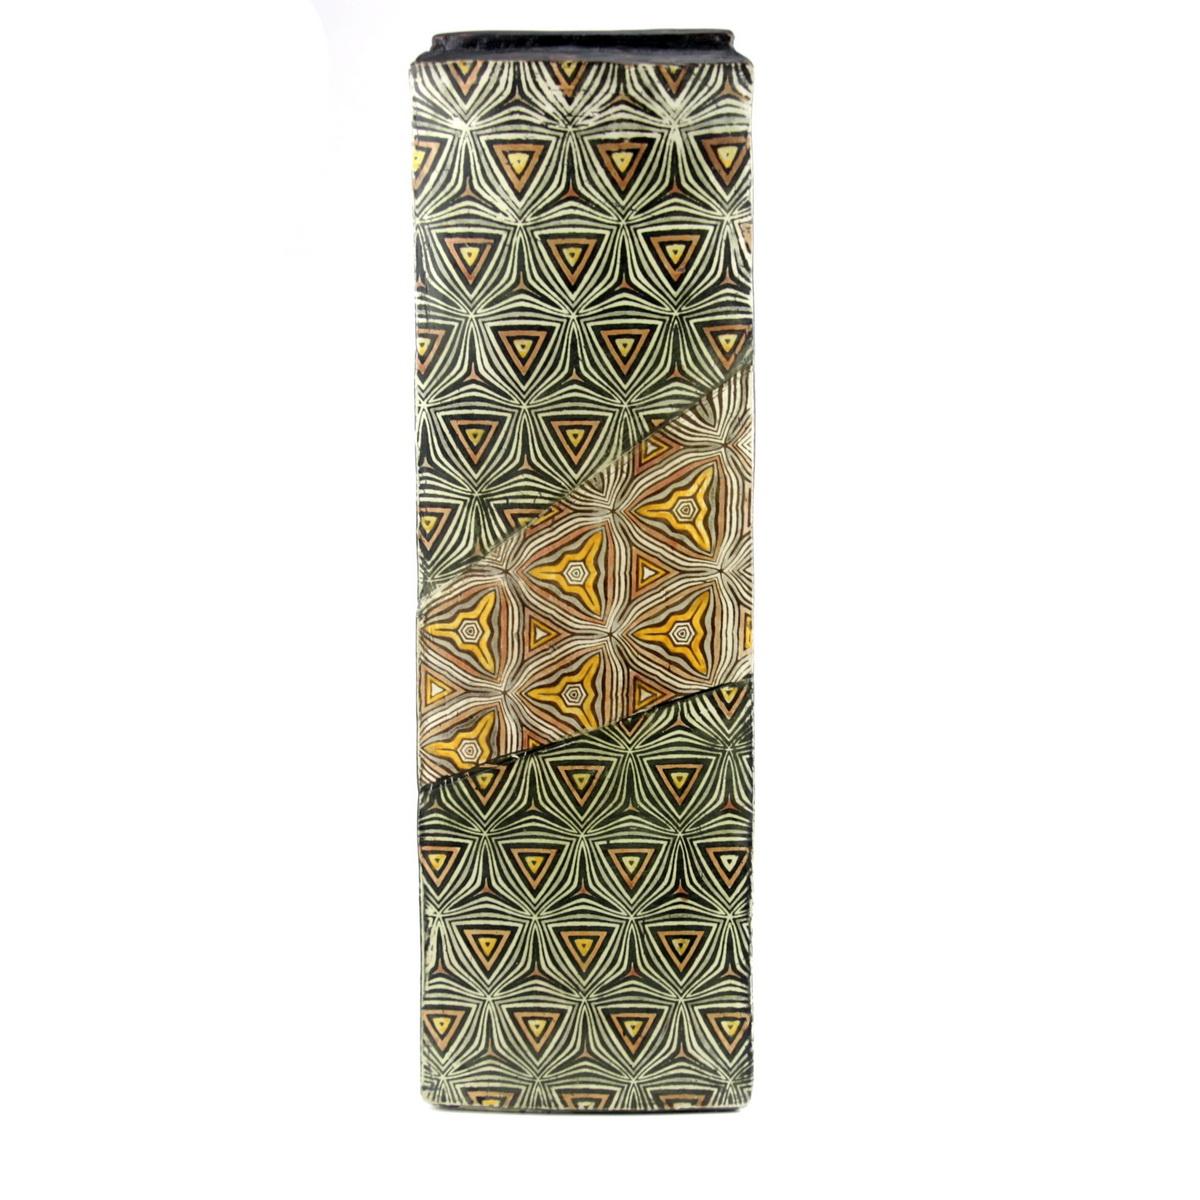 Triangular high rise pot 51x16  £750 - P19